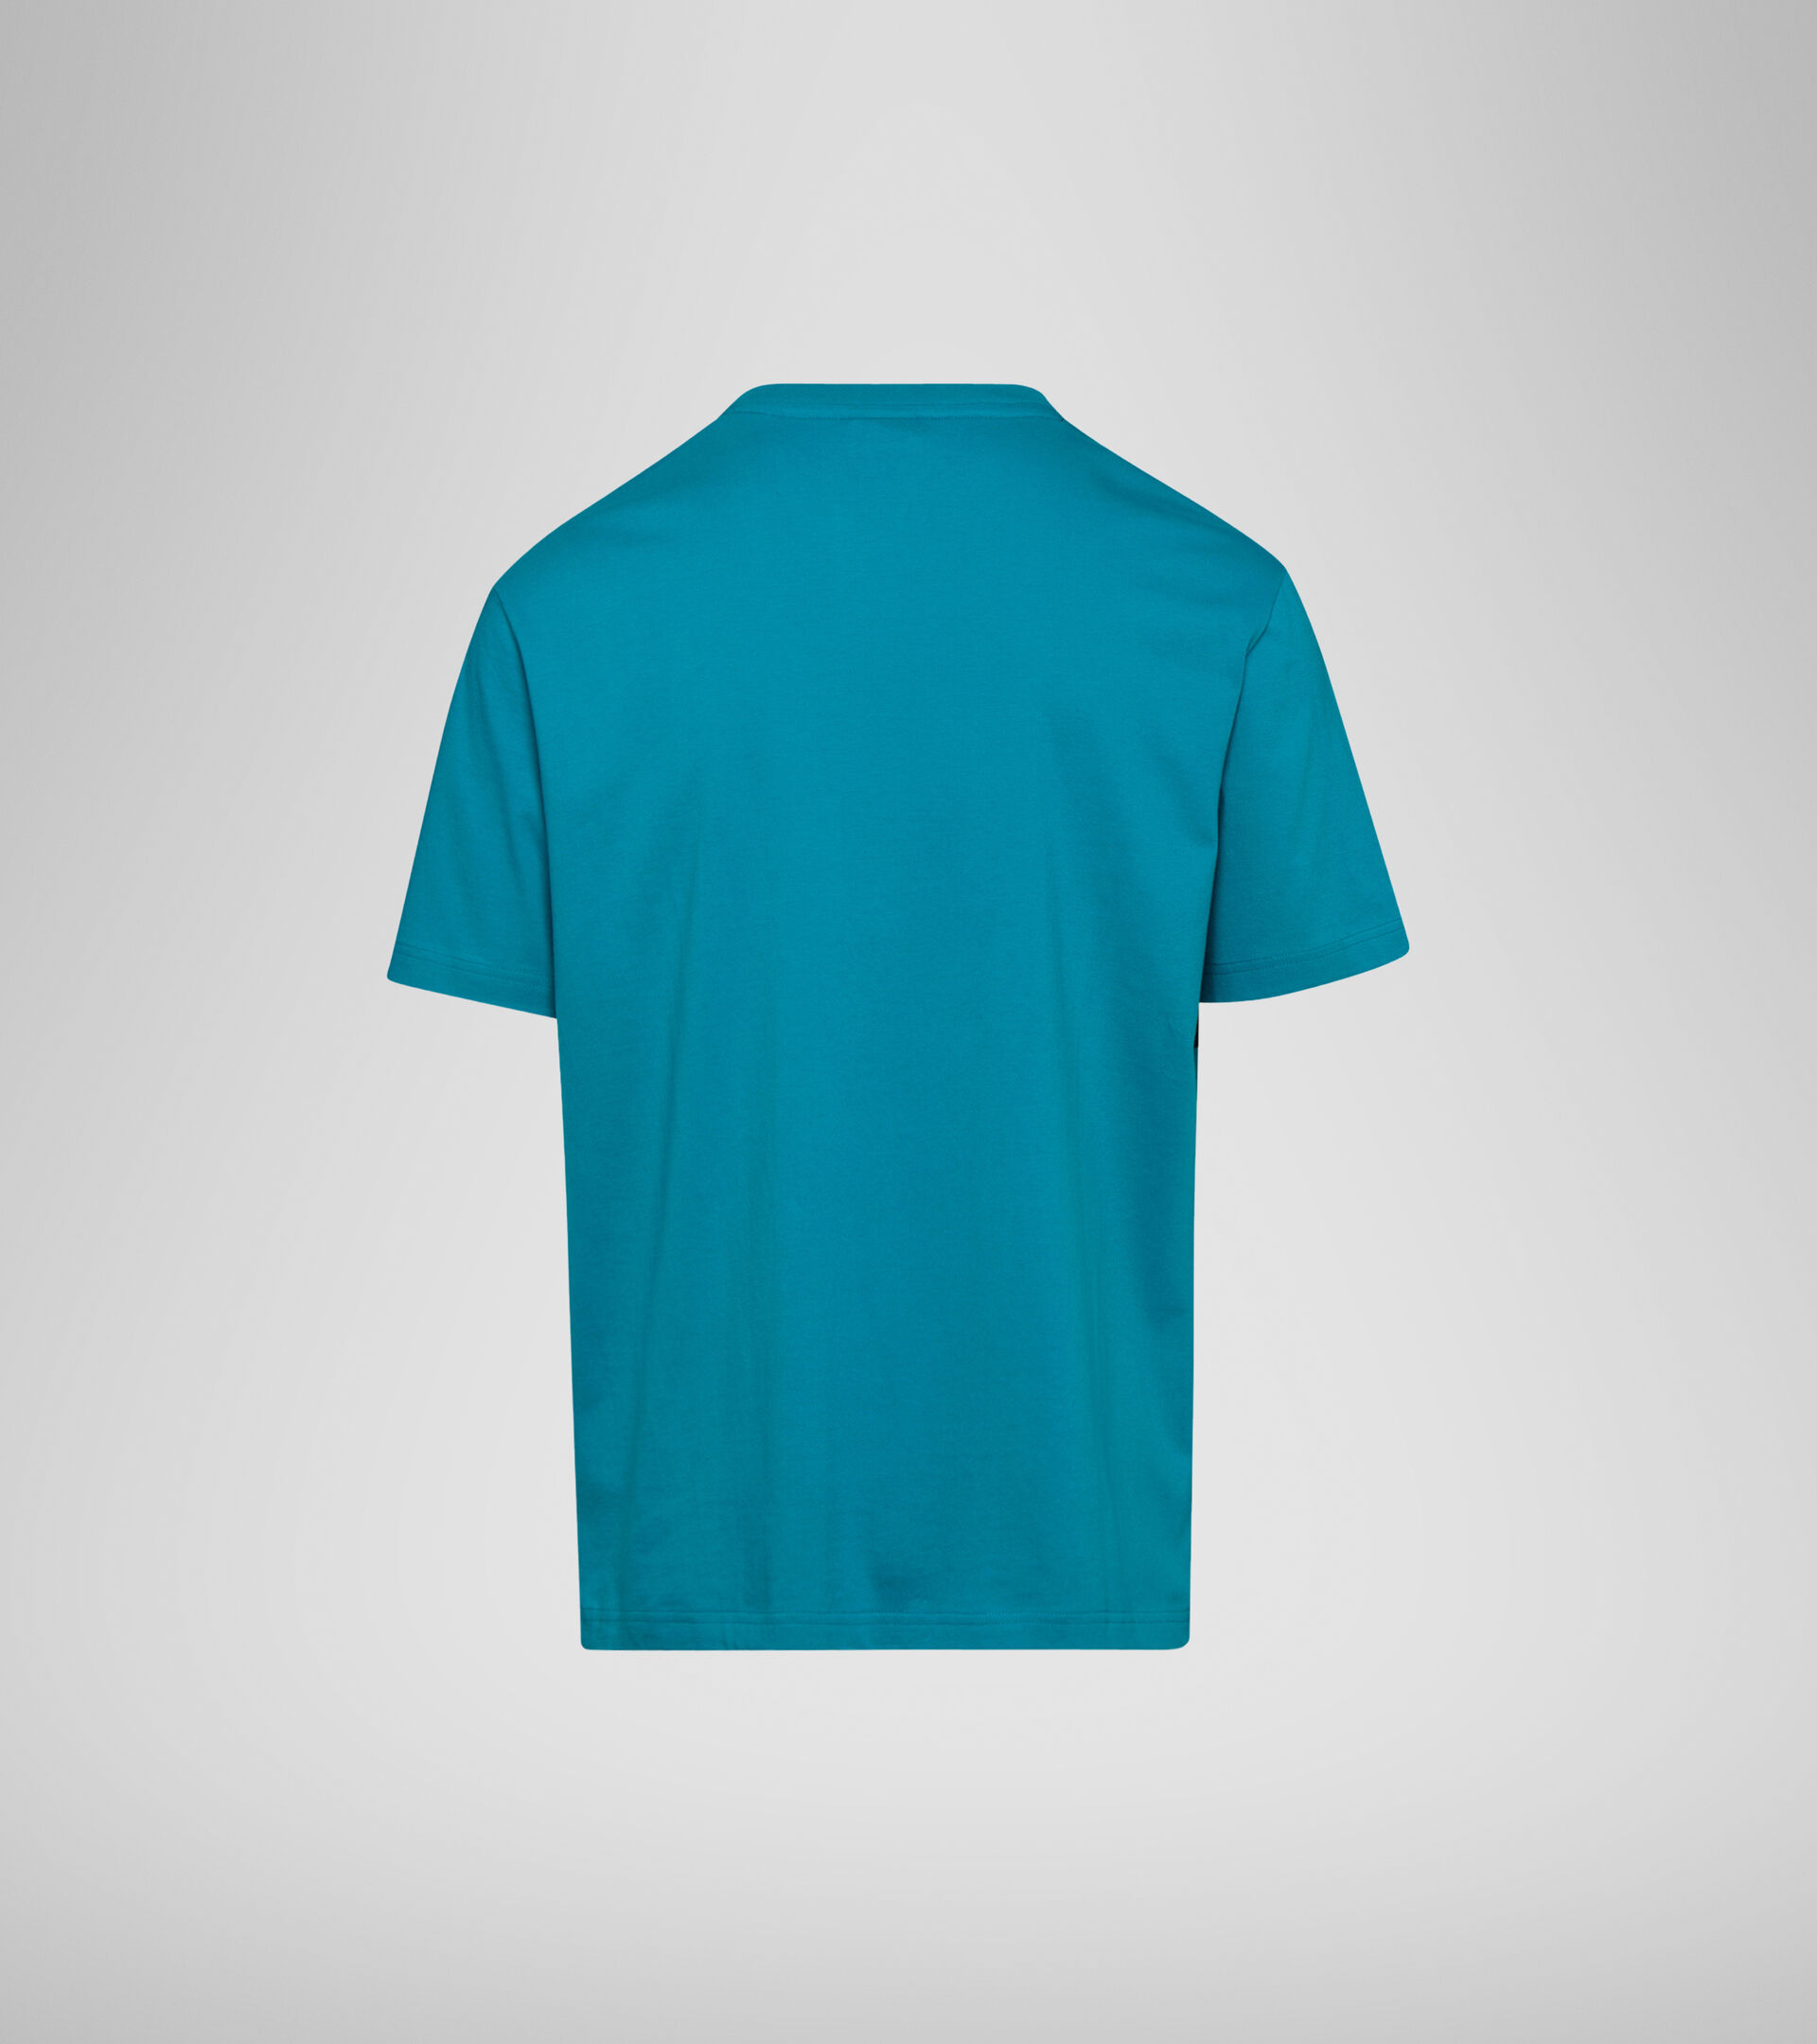 Apparel Sportswear UOMO T-SHIRT SS ICON STELLA VERDE ACQUA Diadora